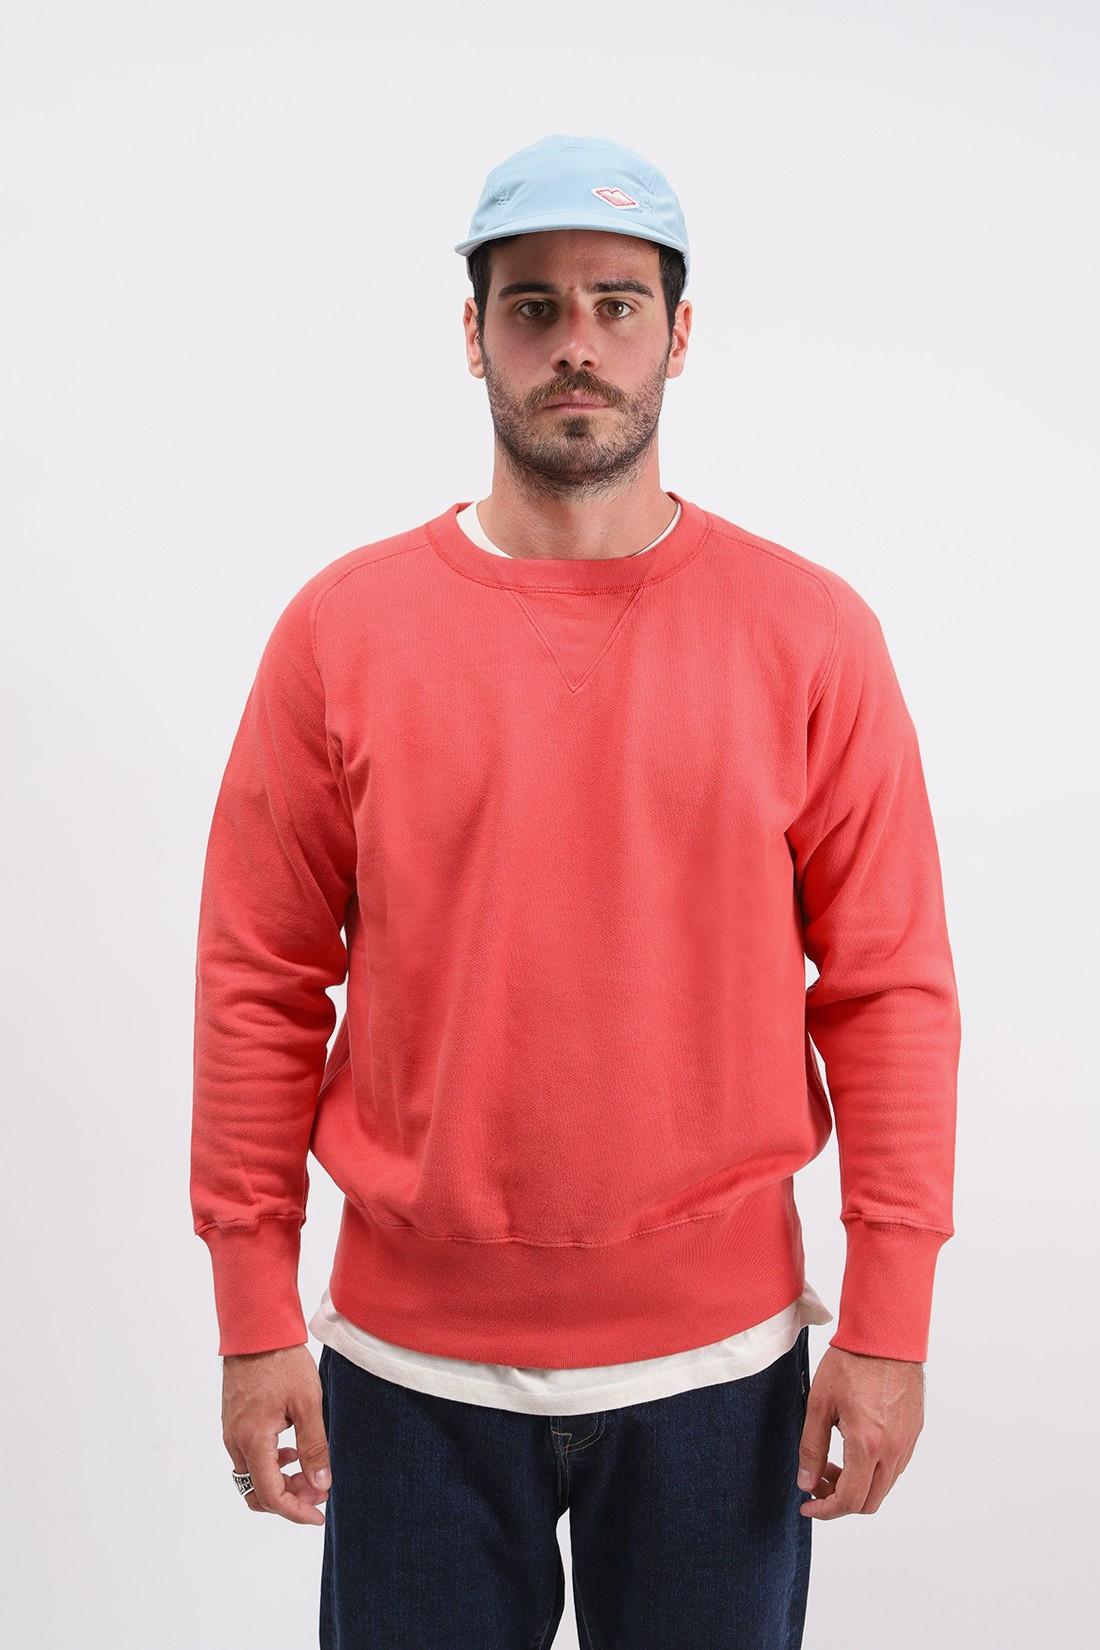 LEVI'S ® VINTAGE CLOTHING / Bay meadows sweatshirt Baked